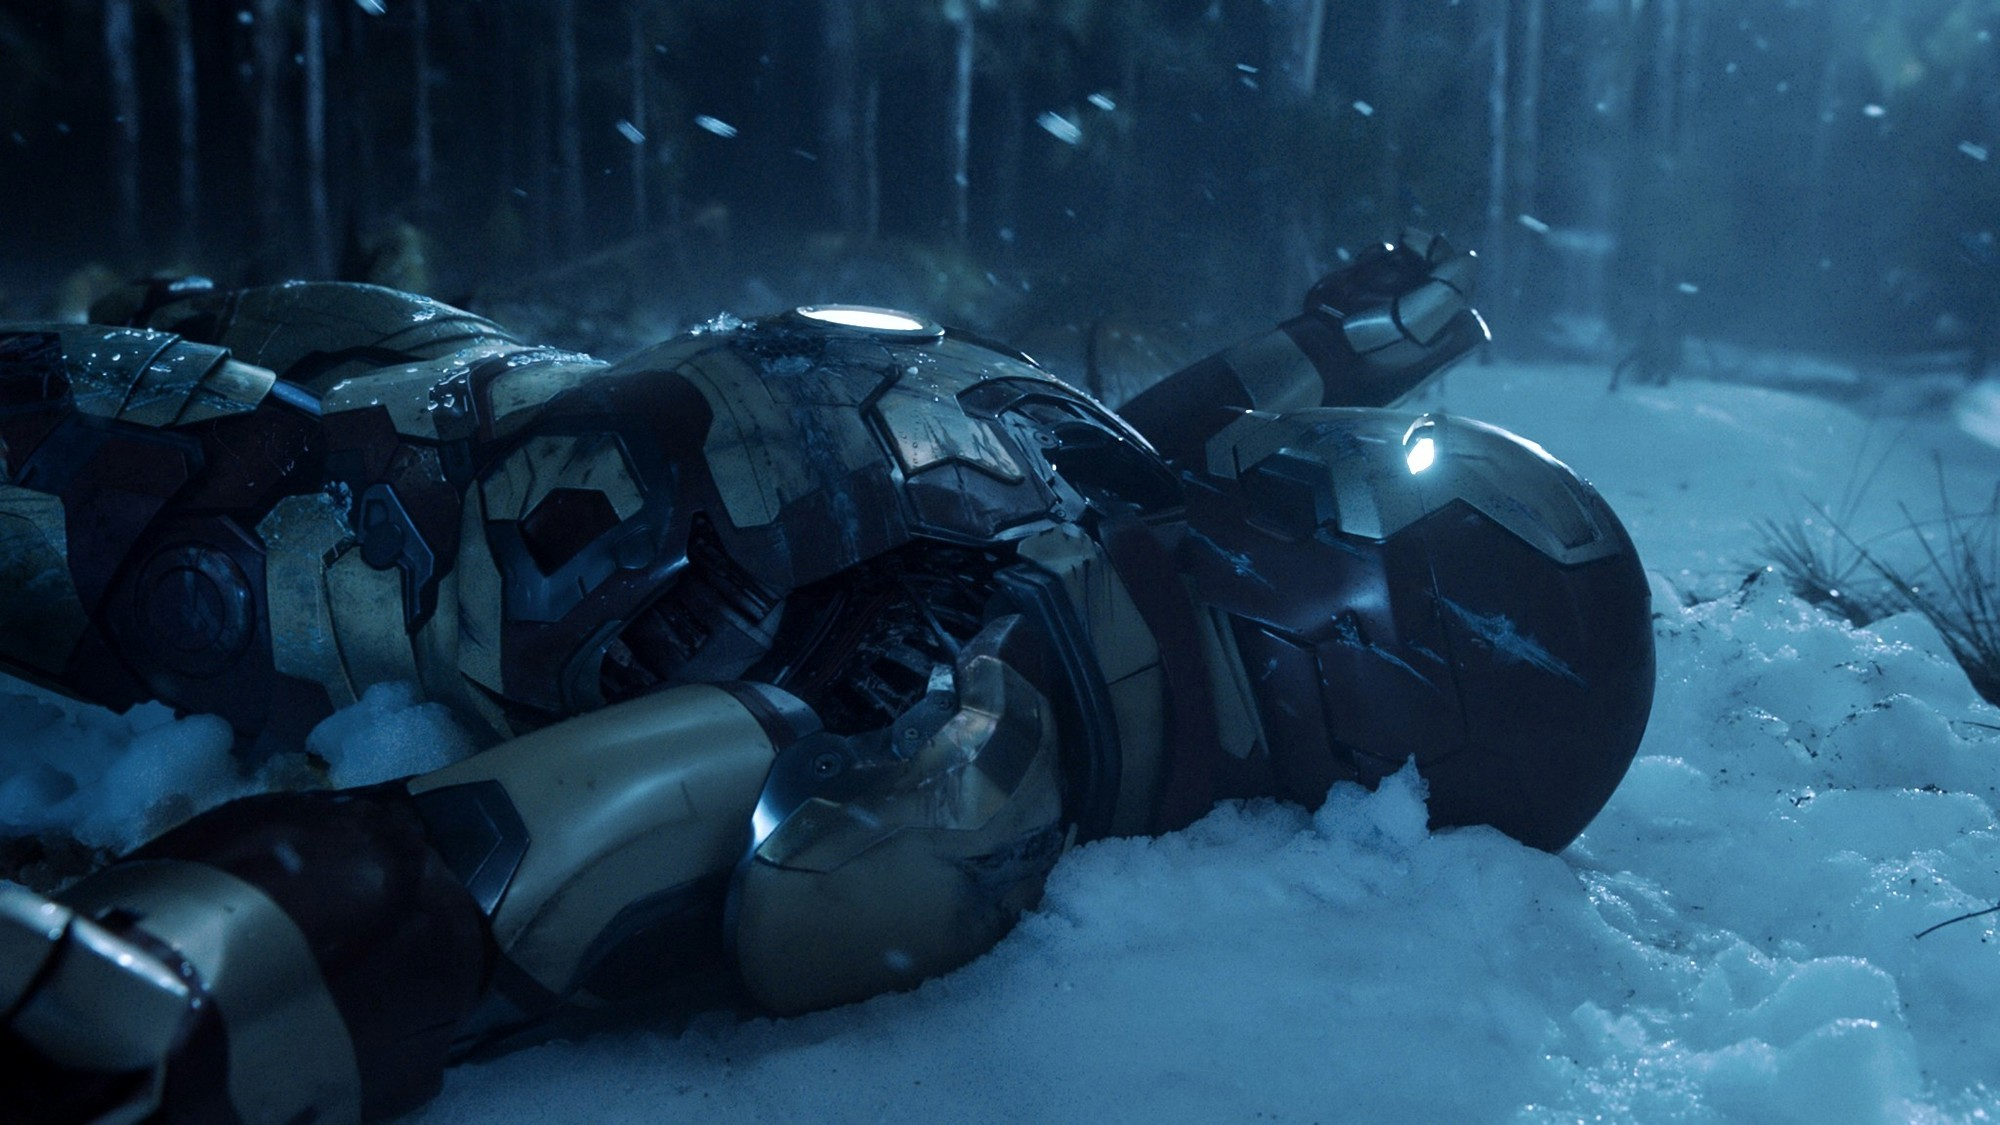 Iron-Man-3-snow.jpg